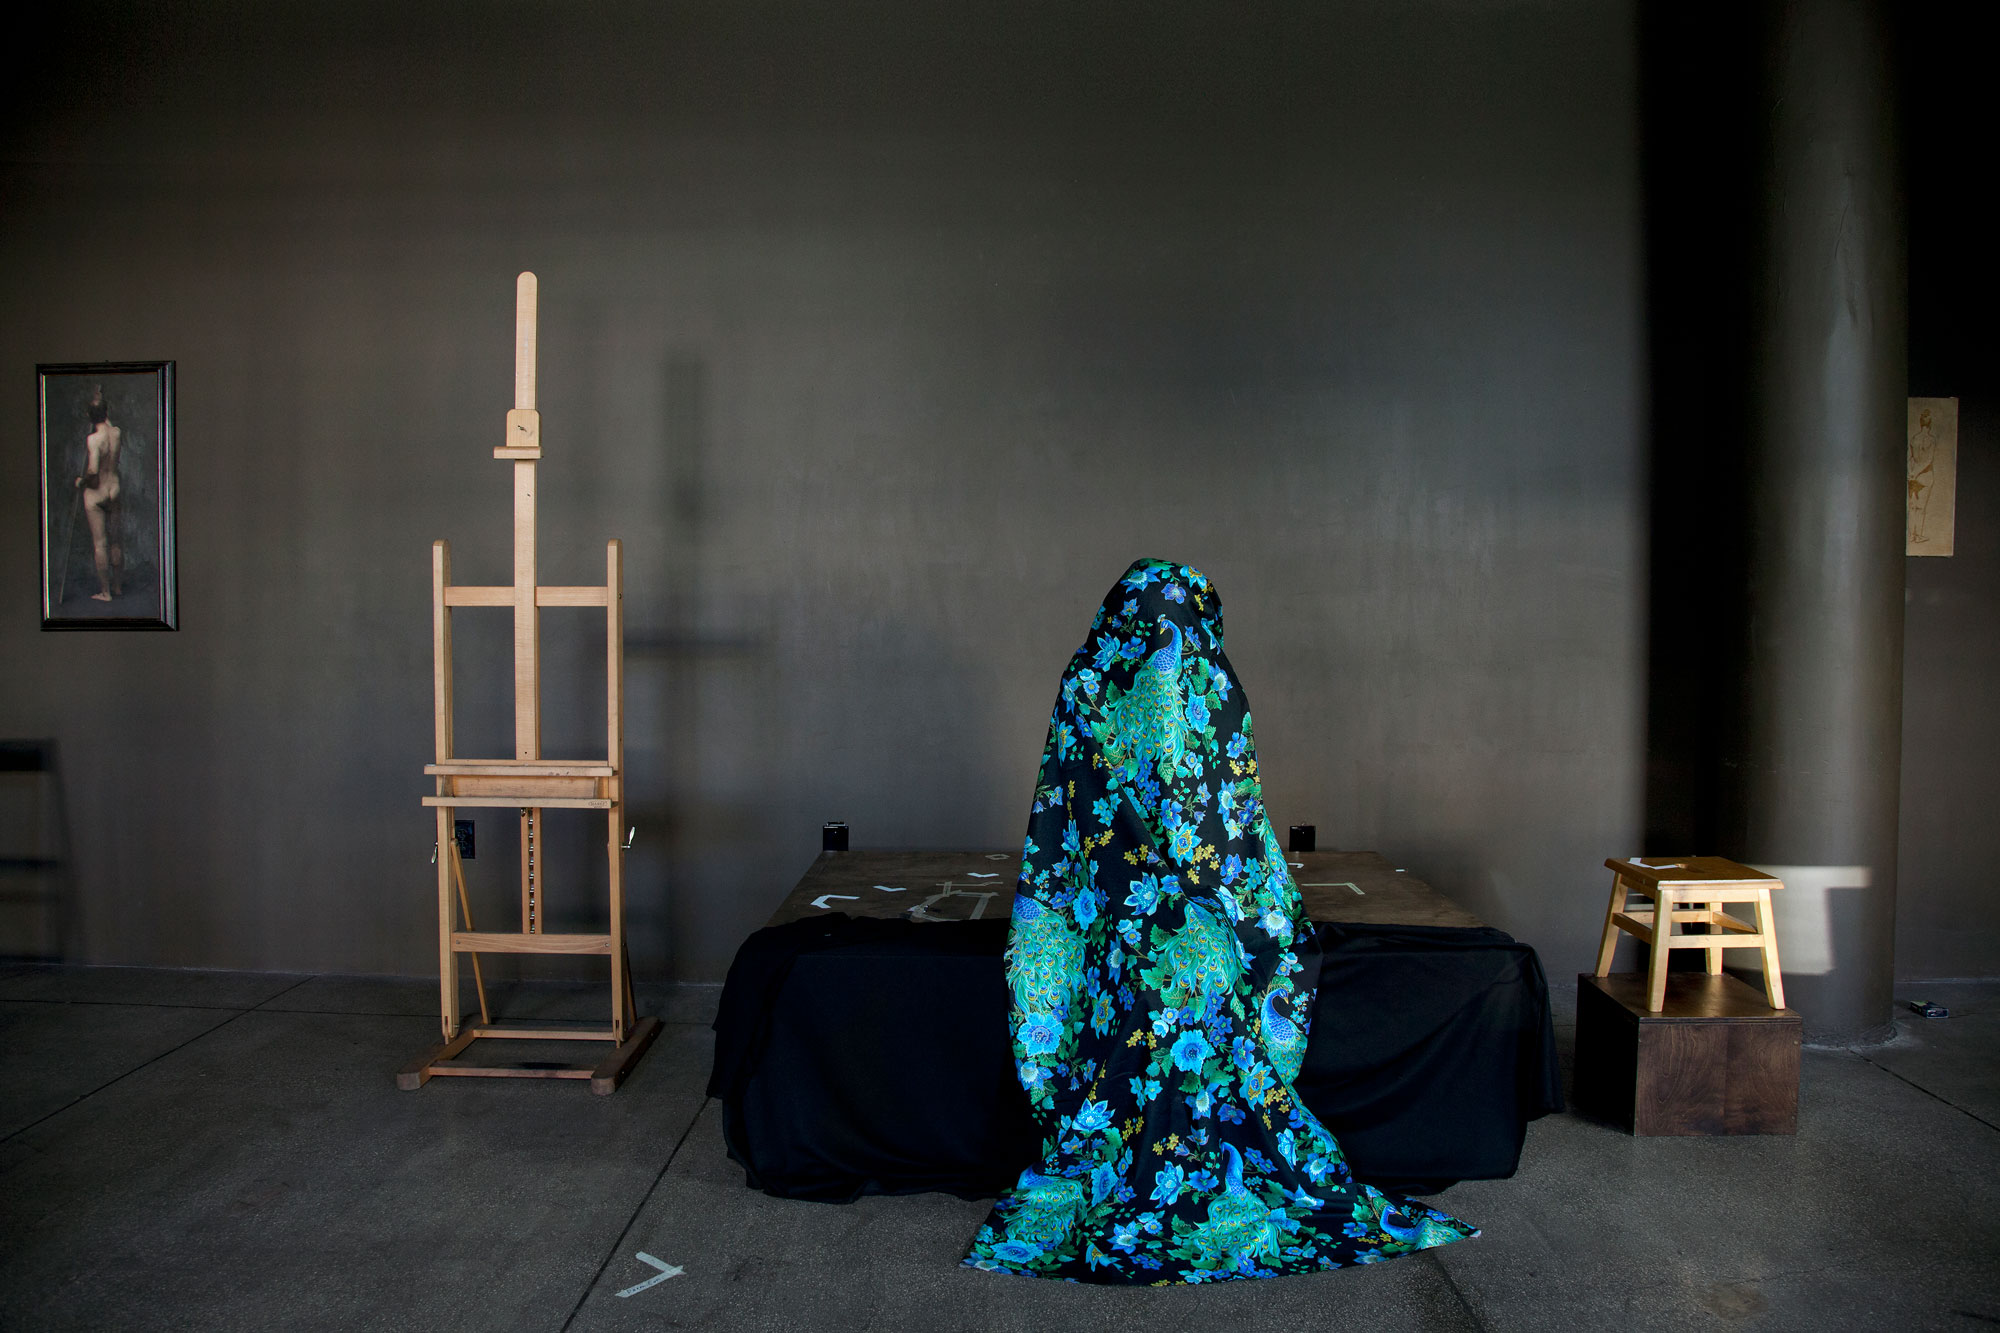 Drawing Room #4 | Lili Almog | Luz Art Los Angeles, CA